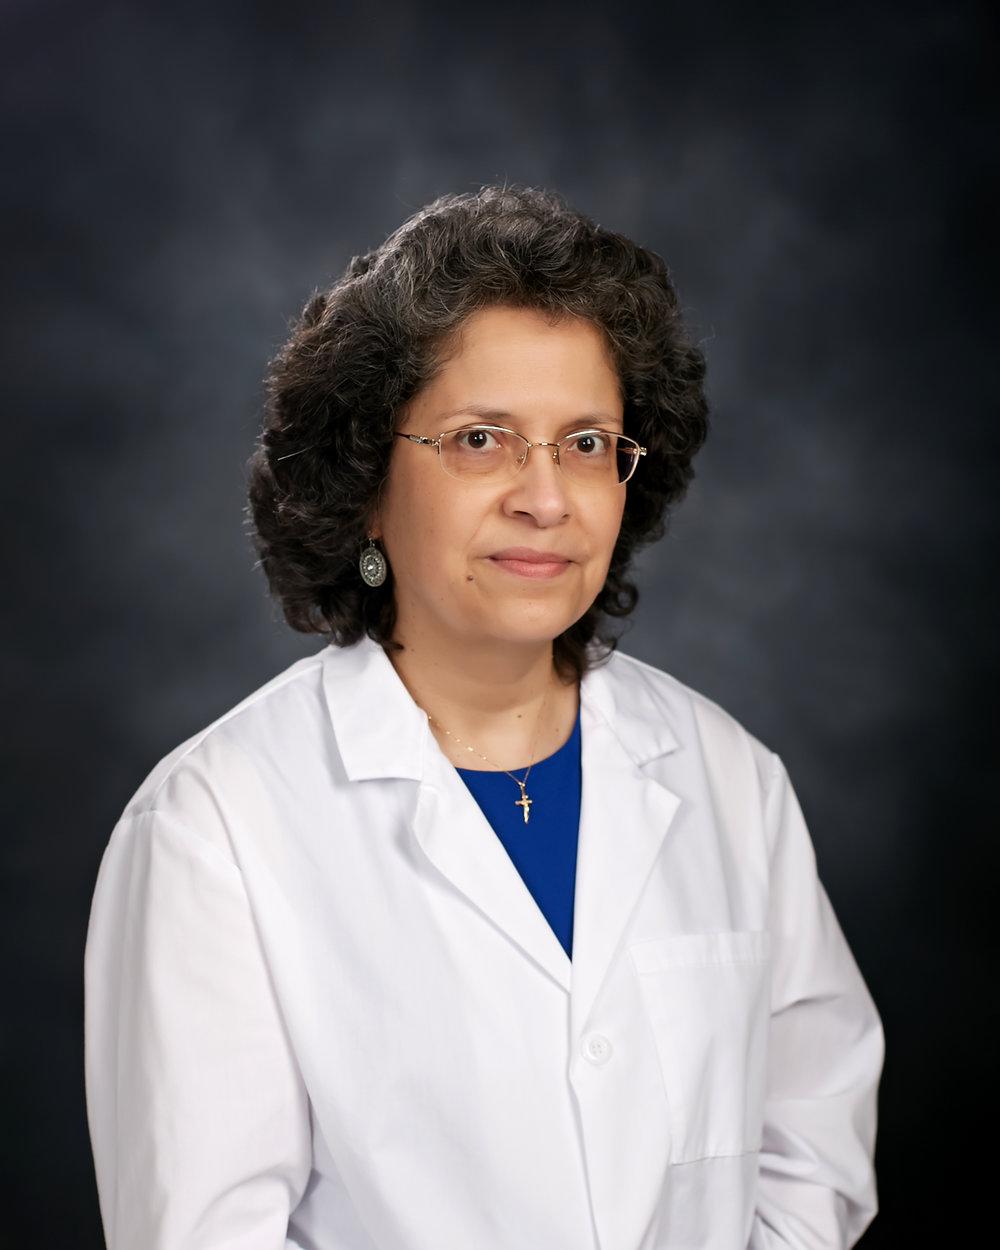 valley-view health-Dr-Ortiz .jpg